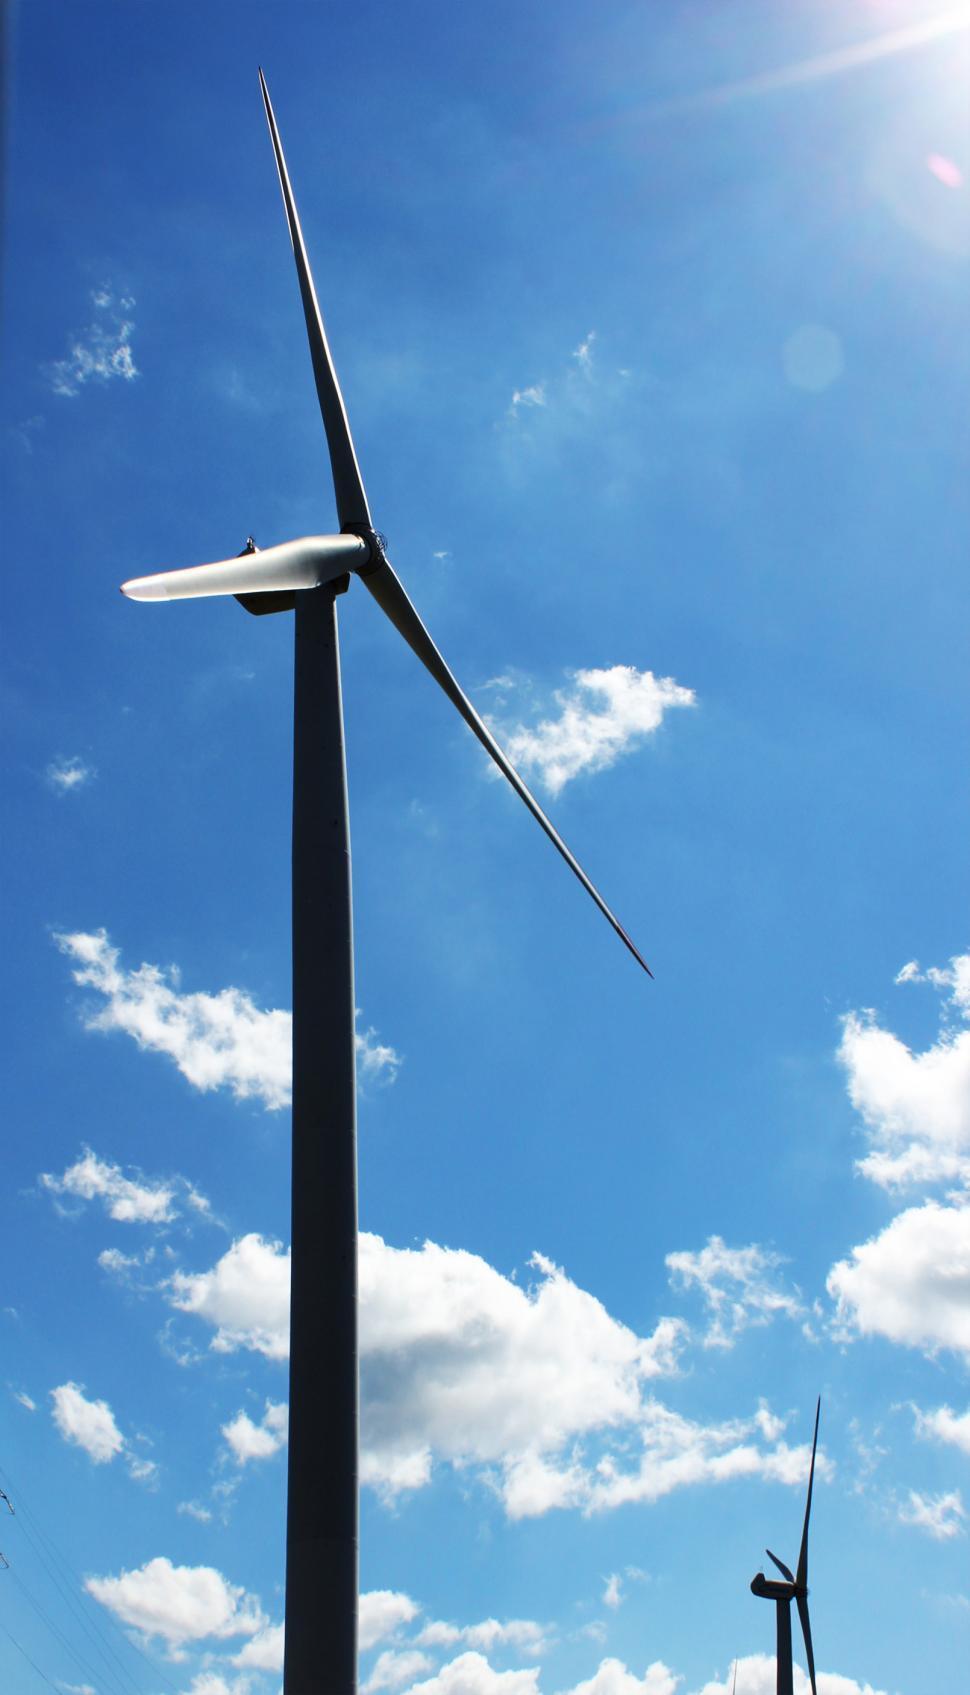 Download Free Stock HD Photo of Wind Turbine - Renewable Power Generation Online